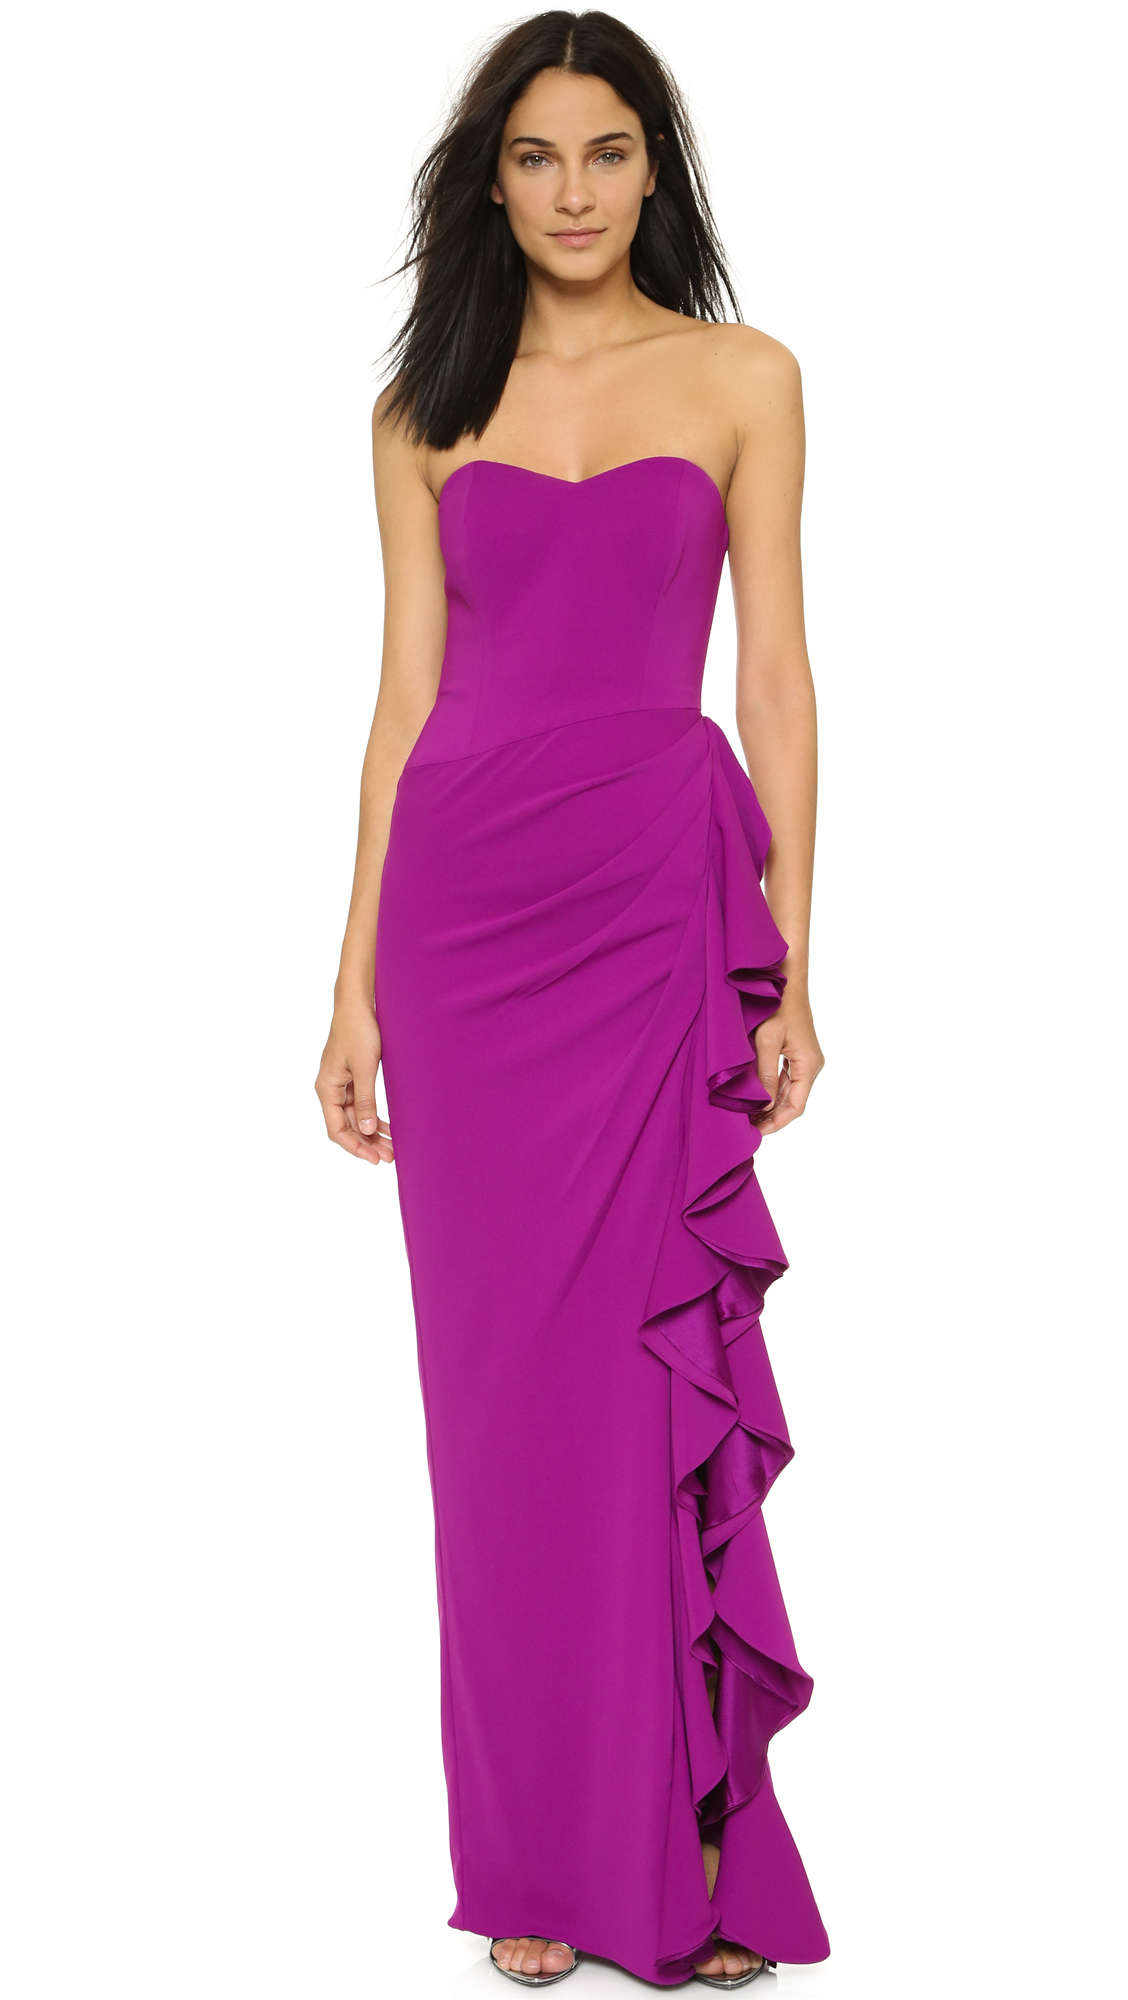 Lujoso Badgley Mischka Wedding Dresses Ideas Ornamento Elaboración ...